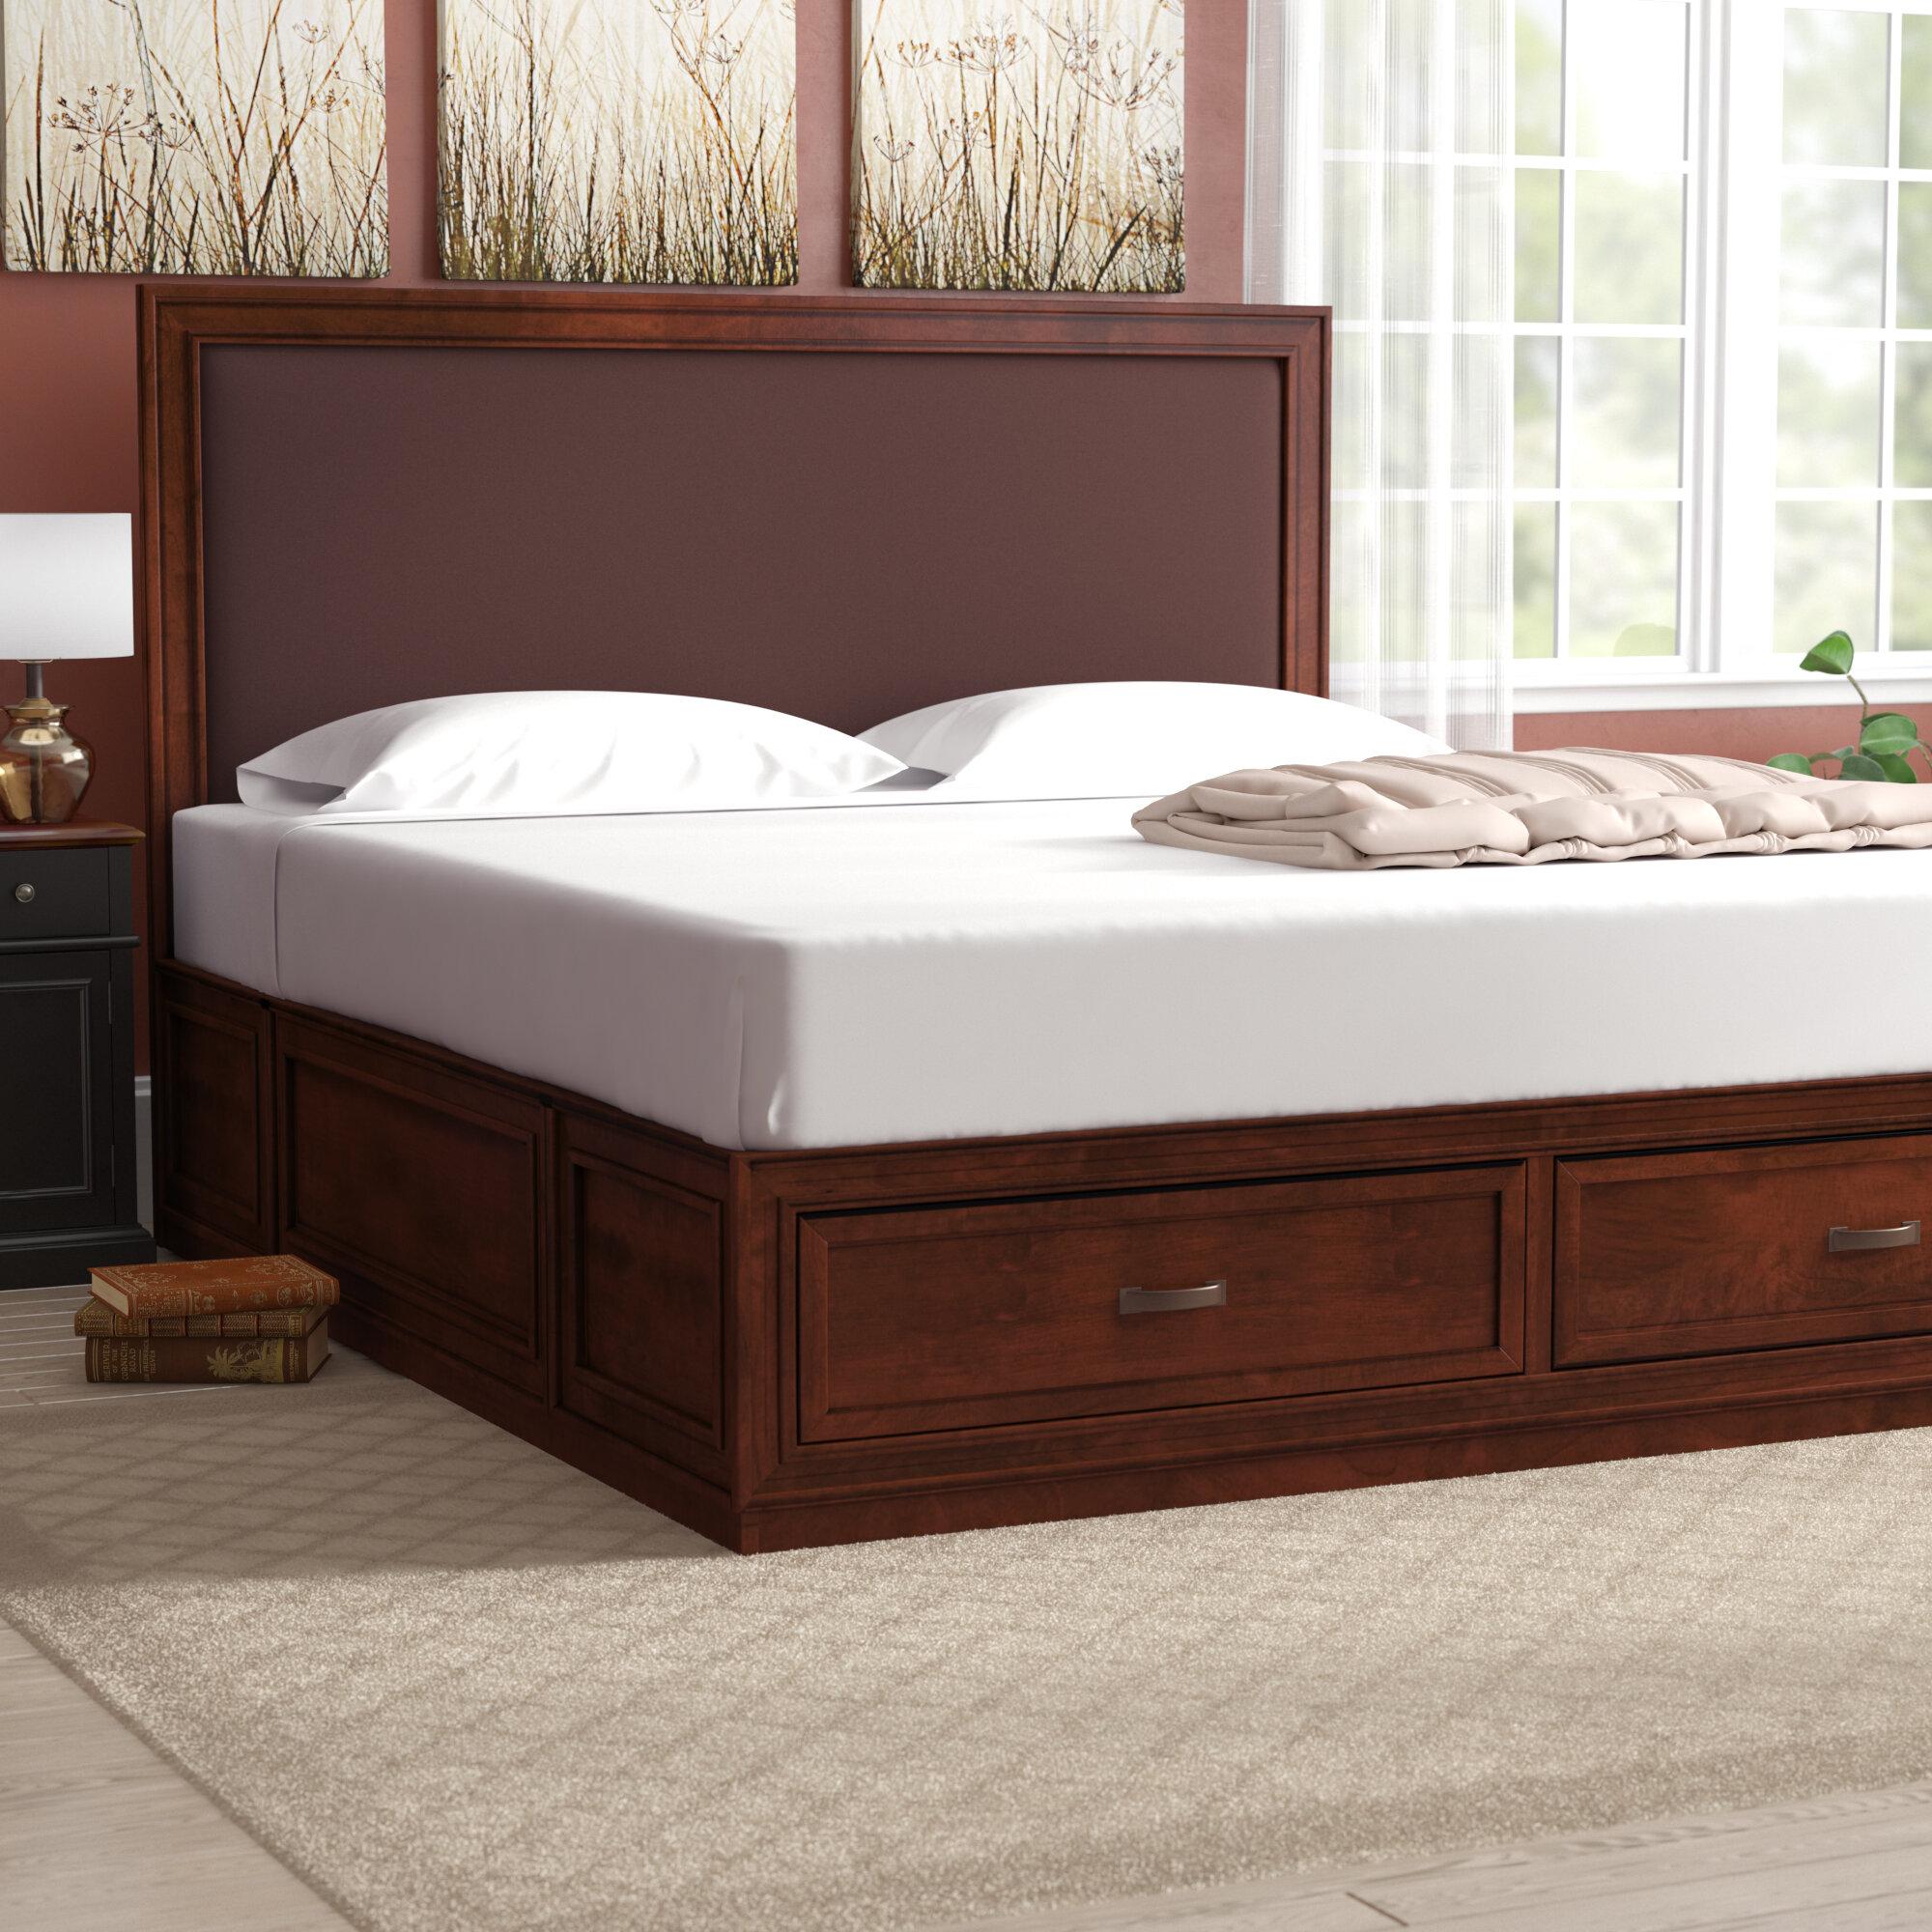 Picture of: Darby Home Co Myra King Upholsteredstorage Platform Bed